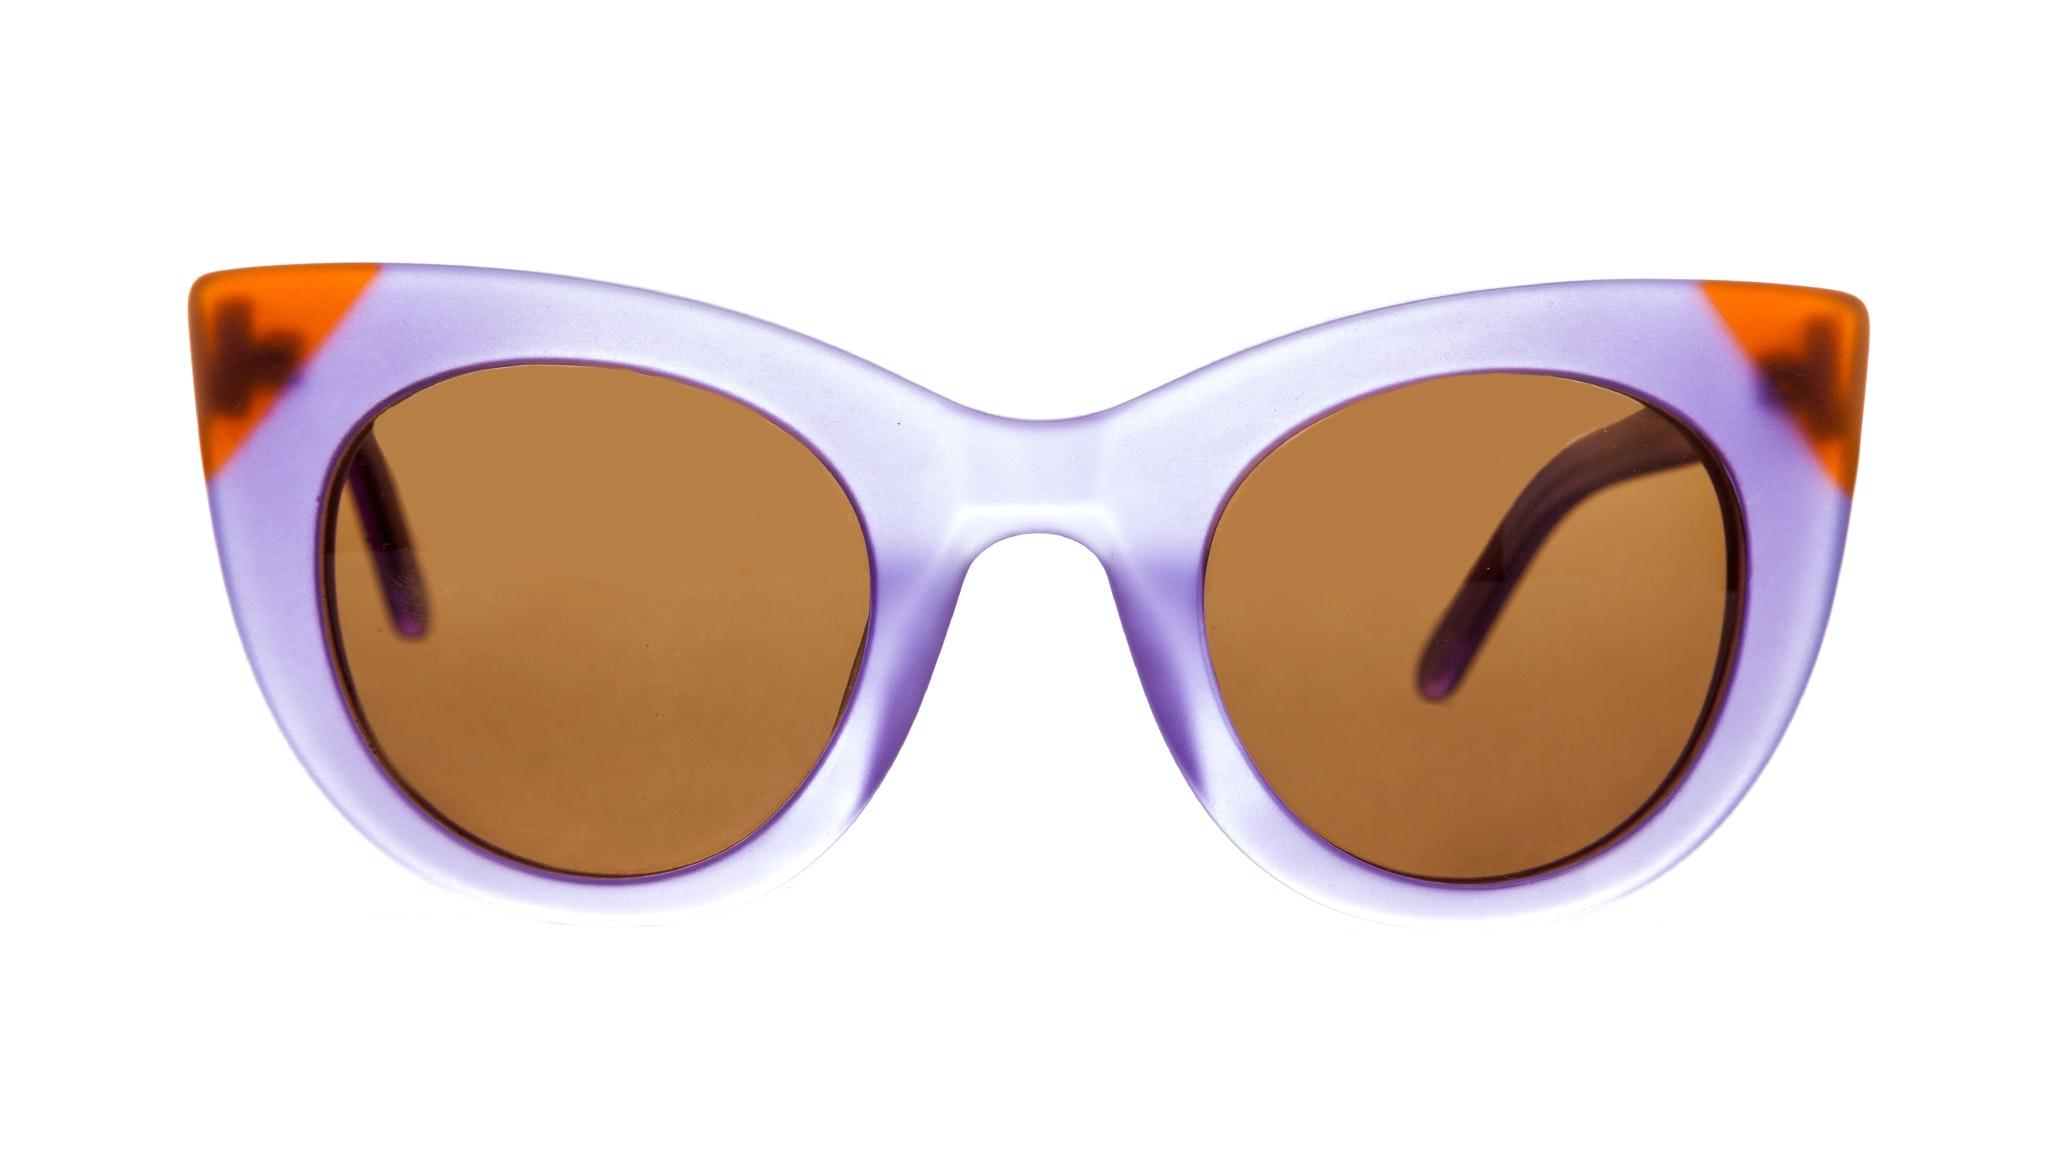 Affordable Fashion Glasses Cat Eye Sunglasses Women Glam Violet Marsala